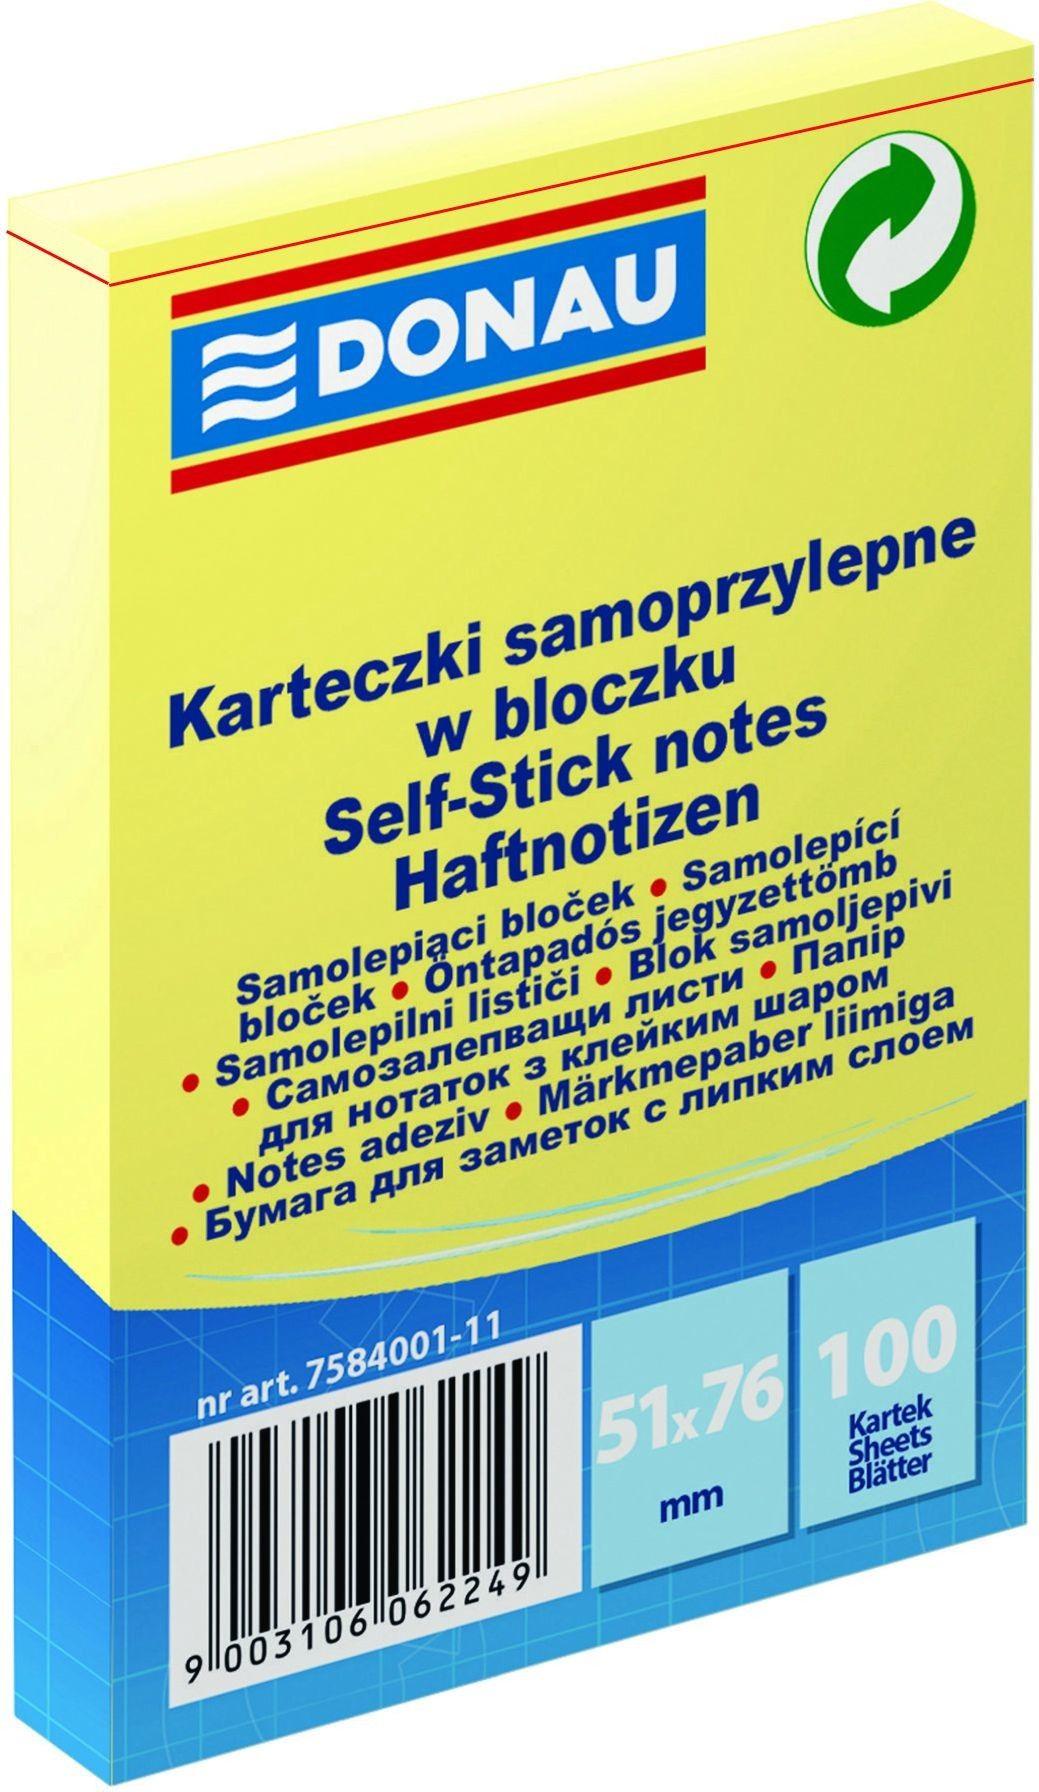 Notes samoprzylepny DONAU 51x76mm 1x100 kart. /7584001-11/